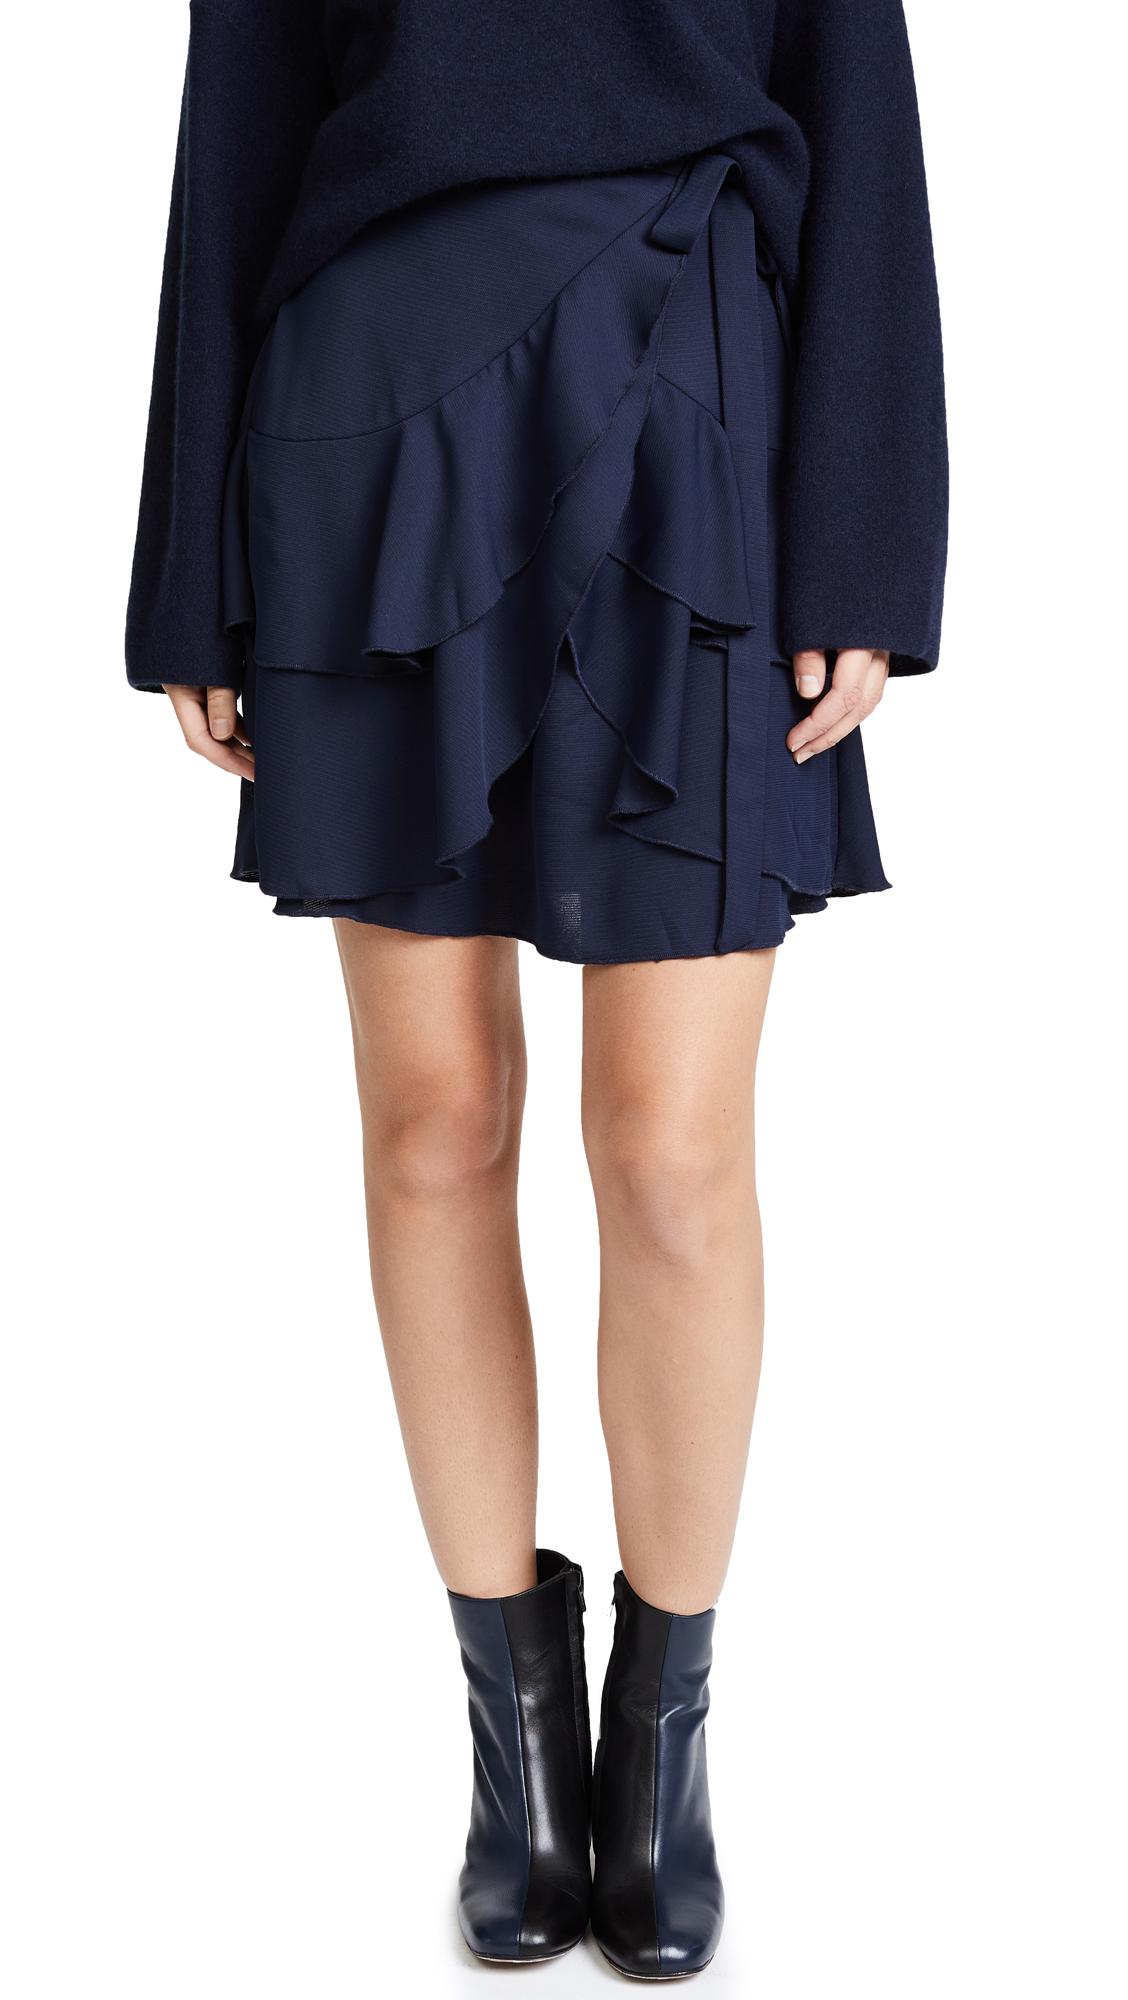 C/Meo Collective Gossamer Miniskirt - Navy